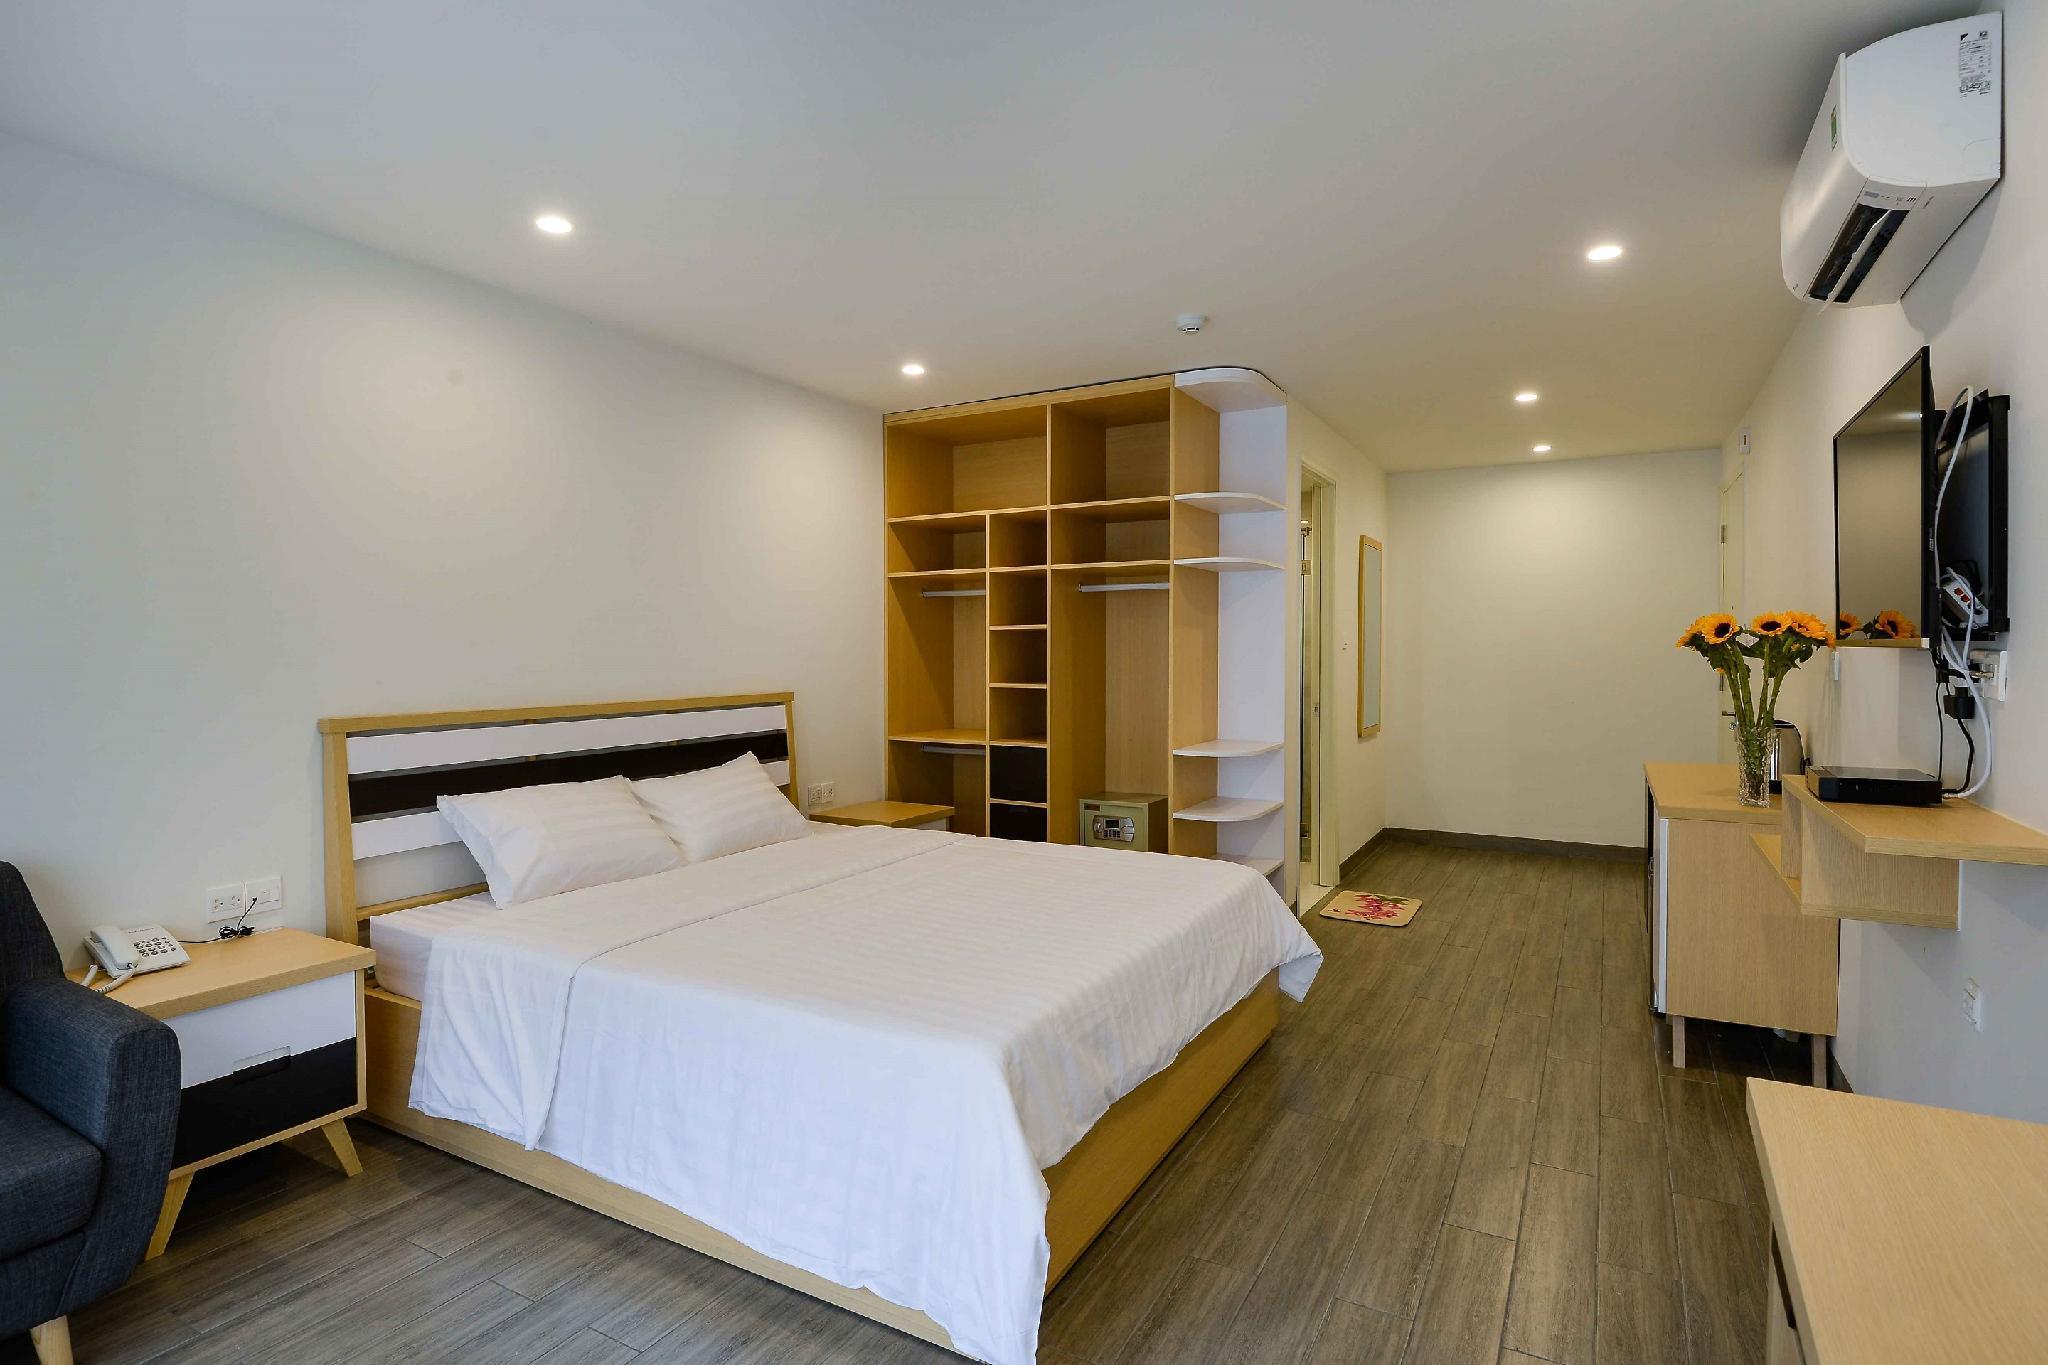 Superior Room With Balcony